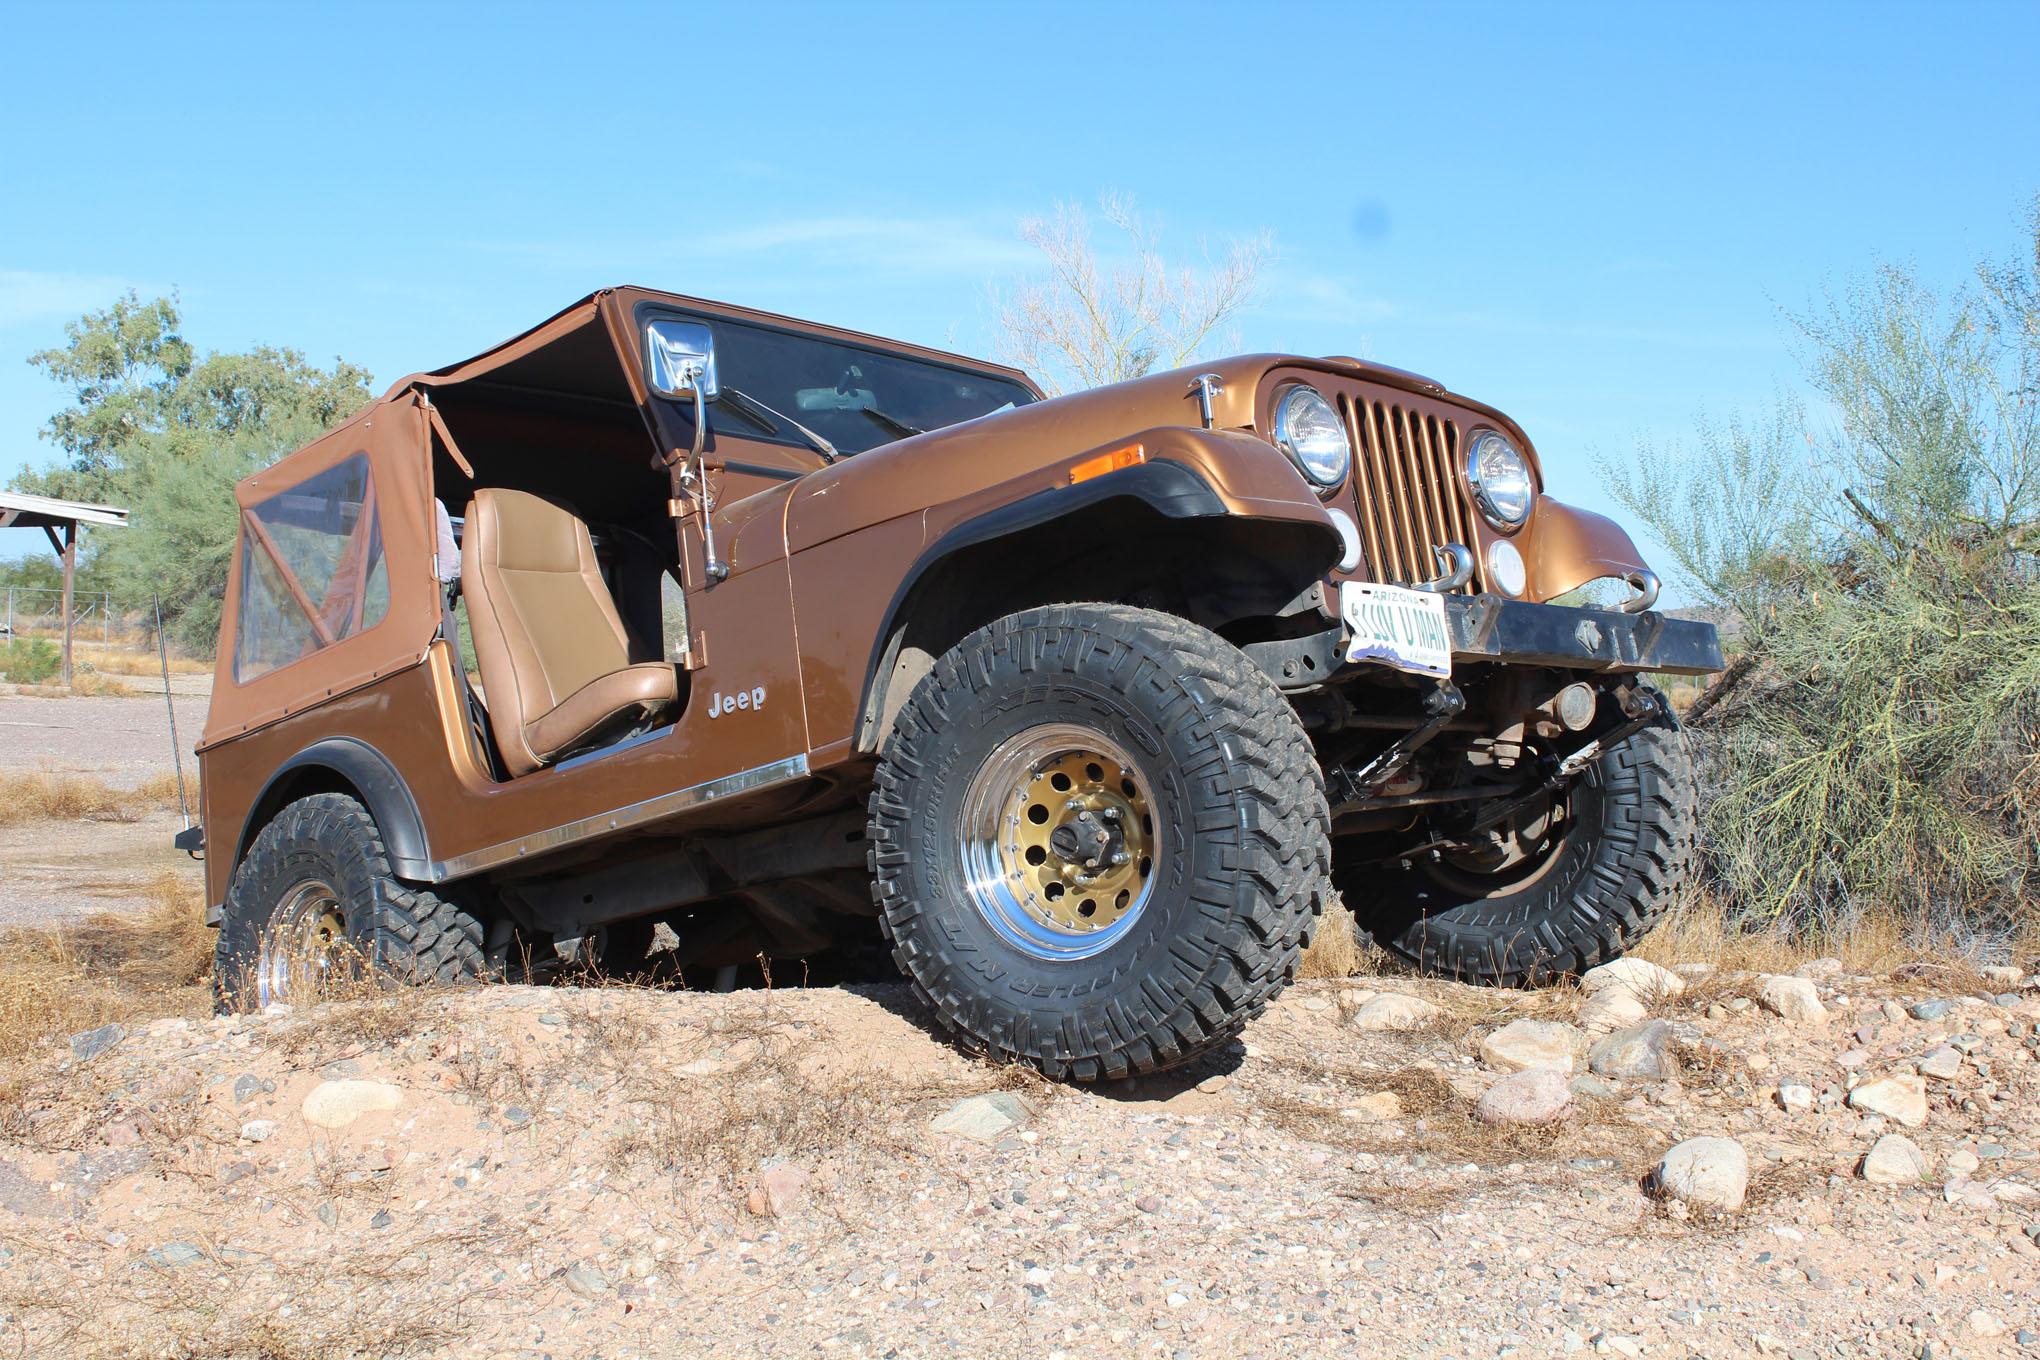 Universal Poly Rear Shock Absorber Lower Car Jeep Bush Kit High Quality